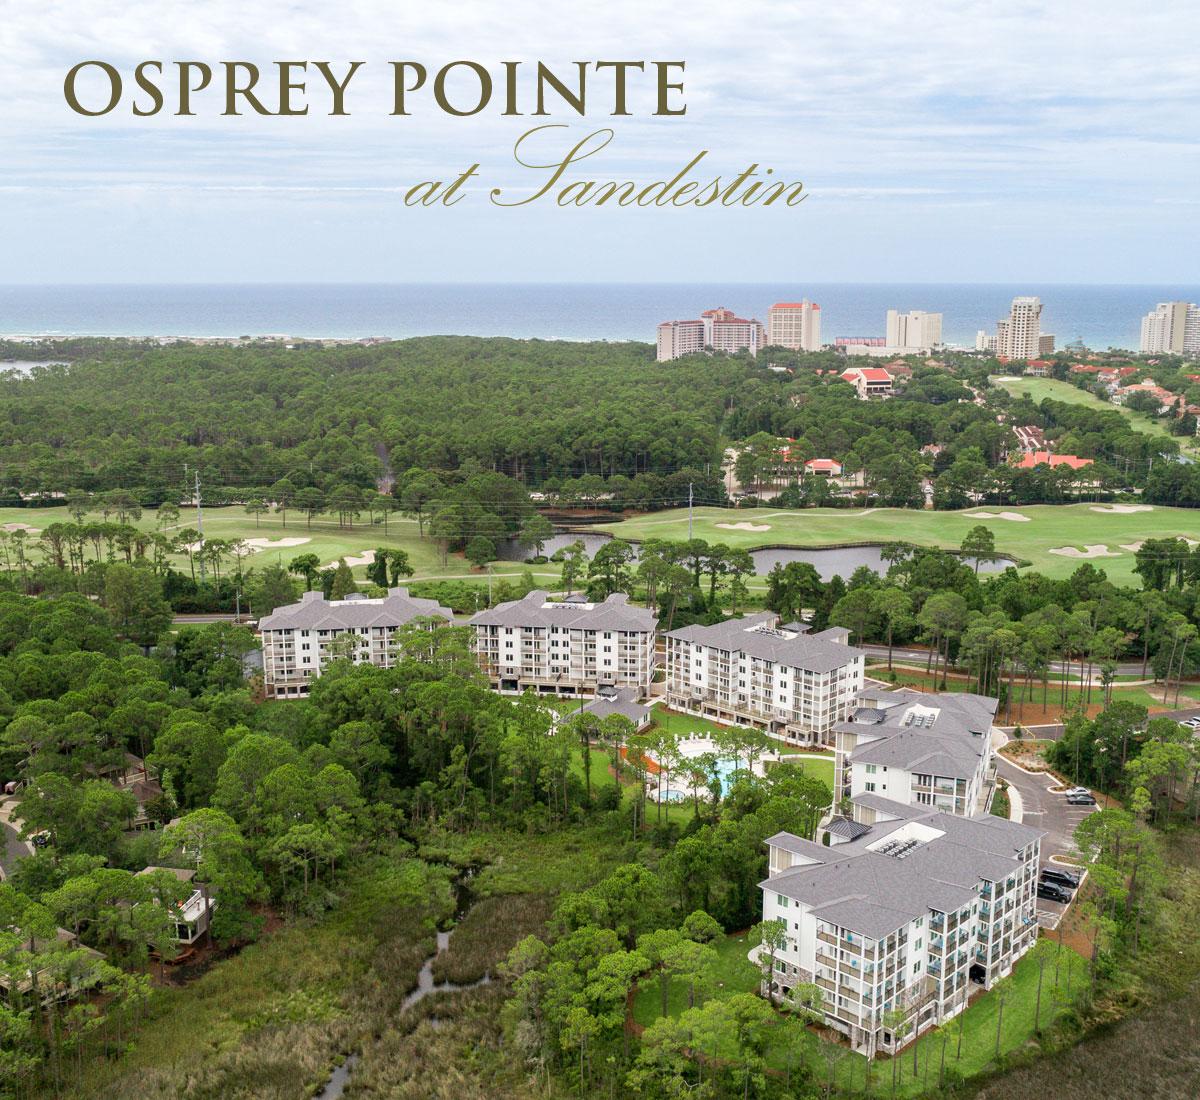 Osprey Pointe at Sandestin